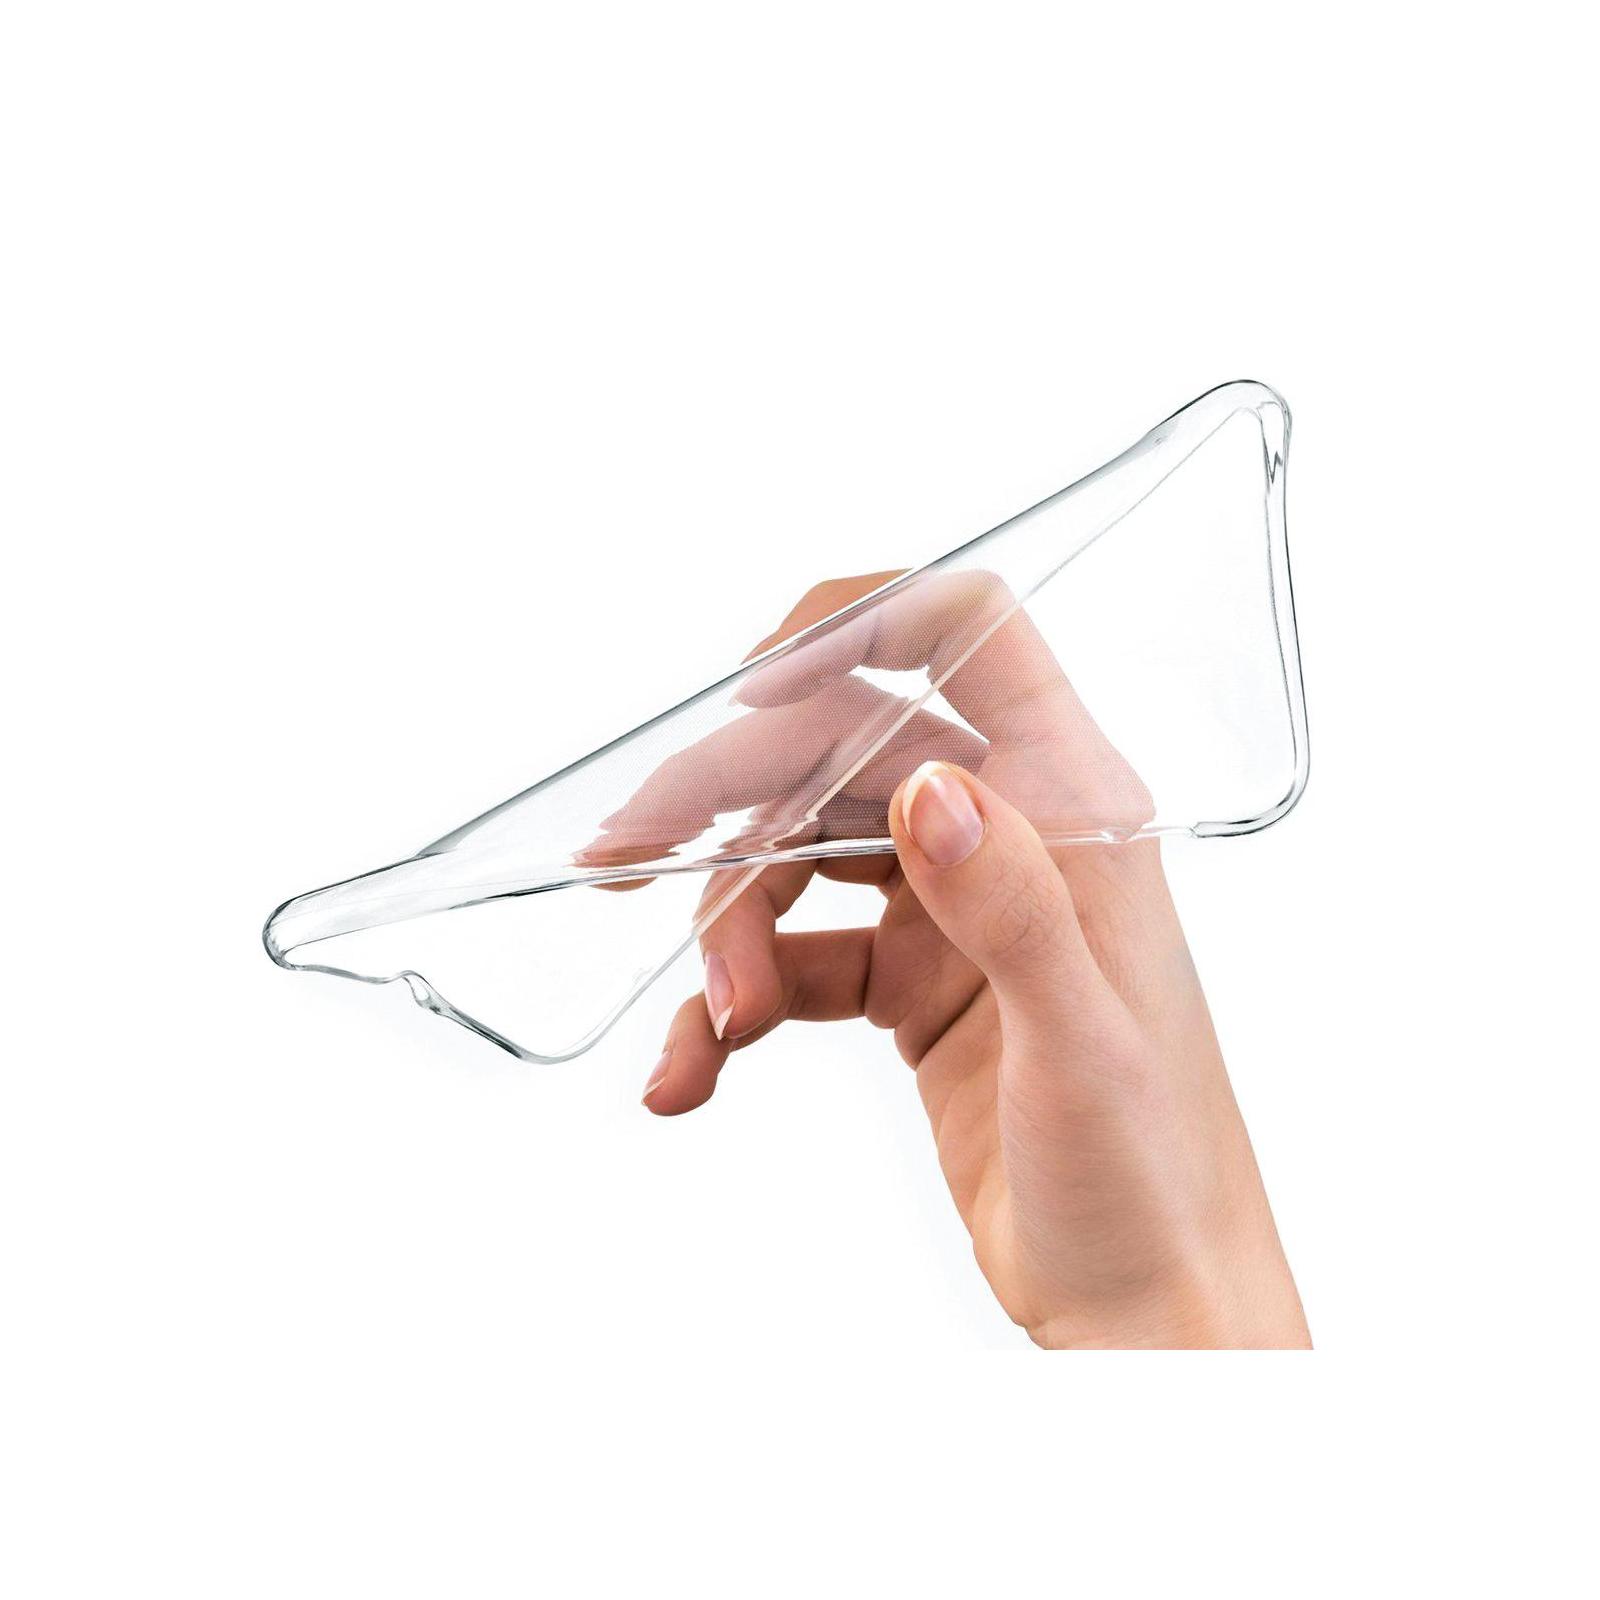 Чехол для моб. телефона Laudtec для Xiaomi Redmi Note 5 Pro Clear tpu (Transperent) (LC-XRN5P) изображение 8